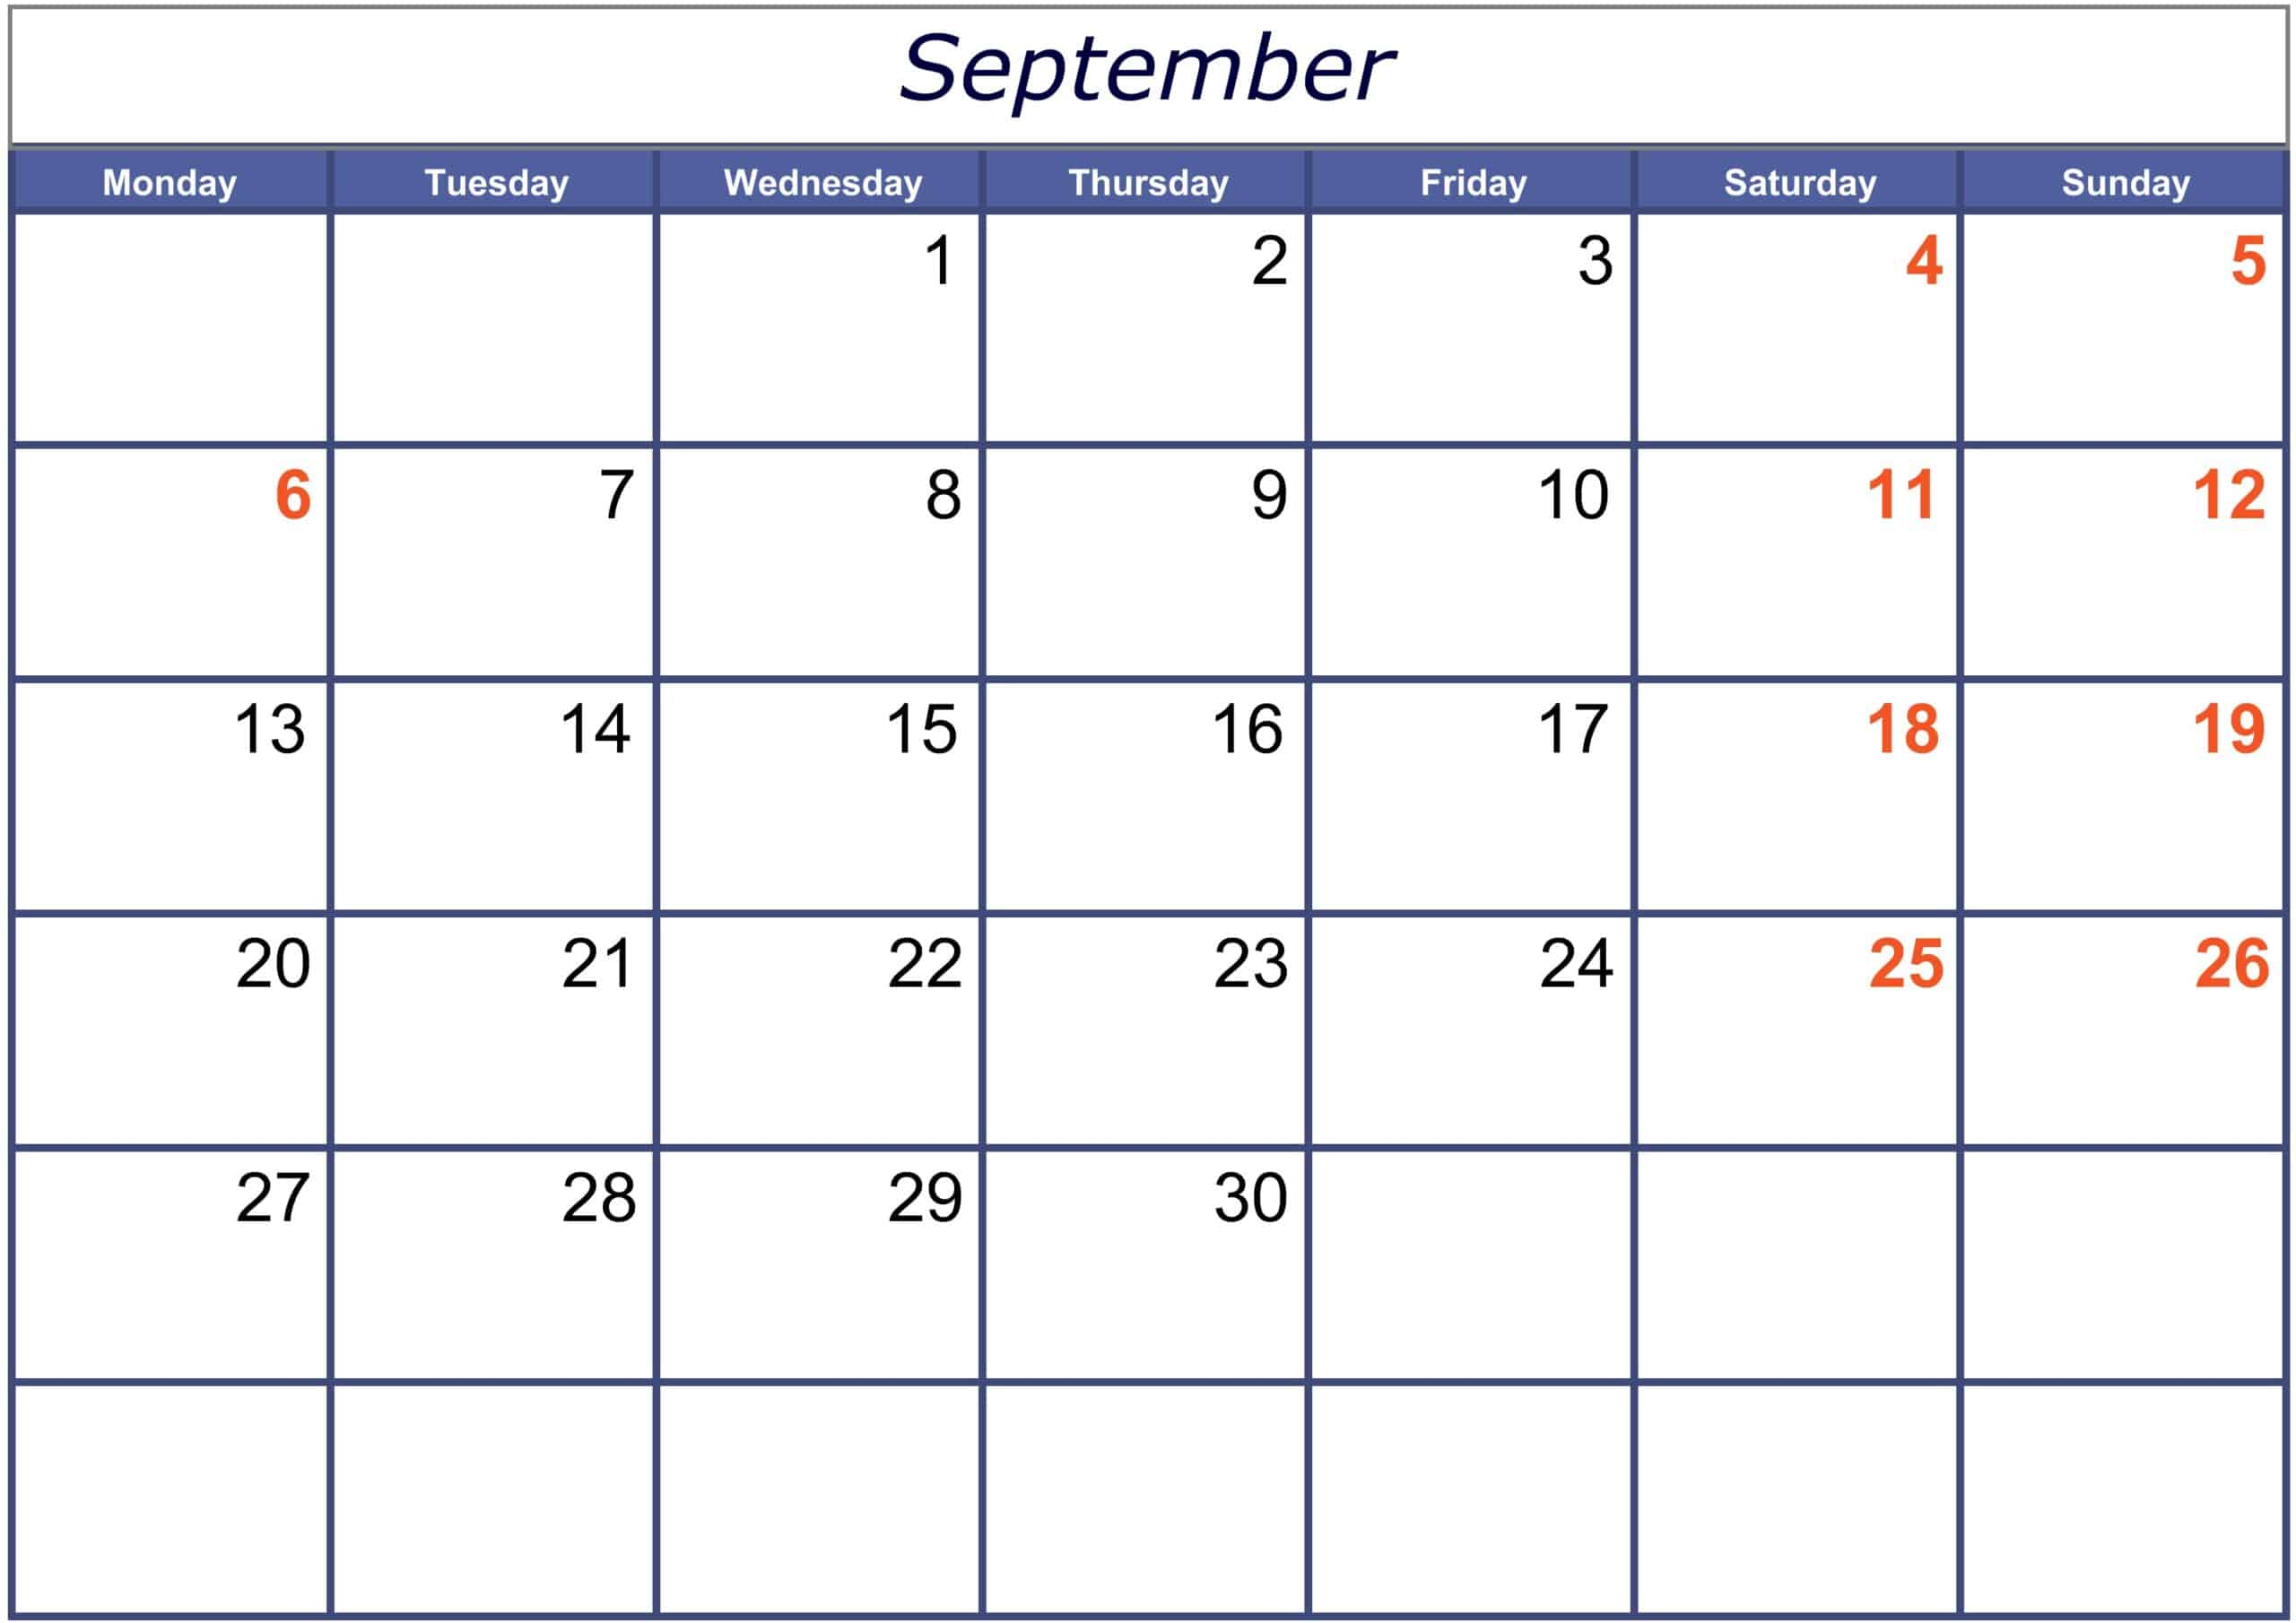 Excel September 2021 Calendar